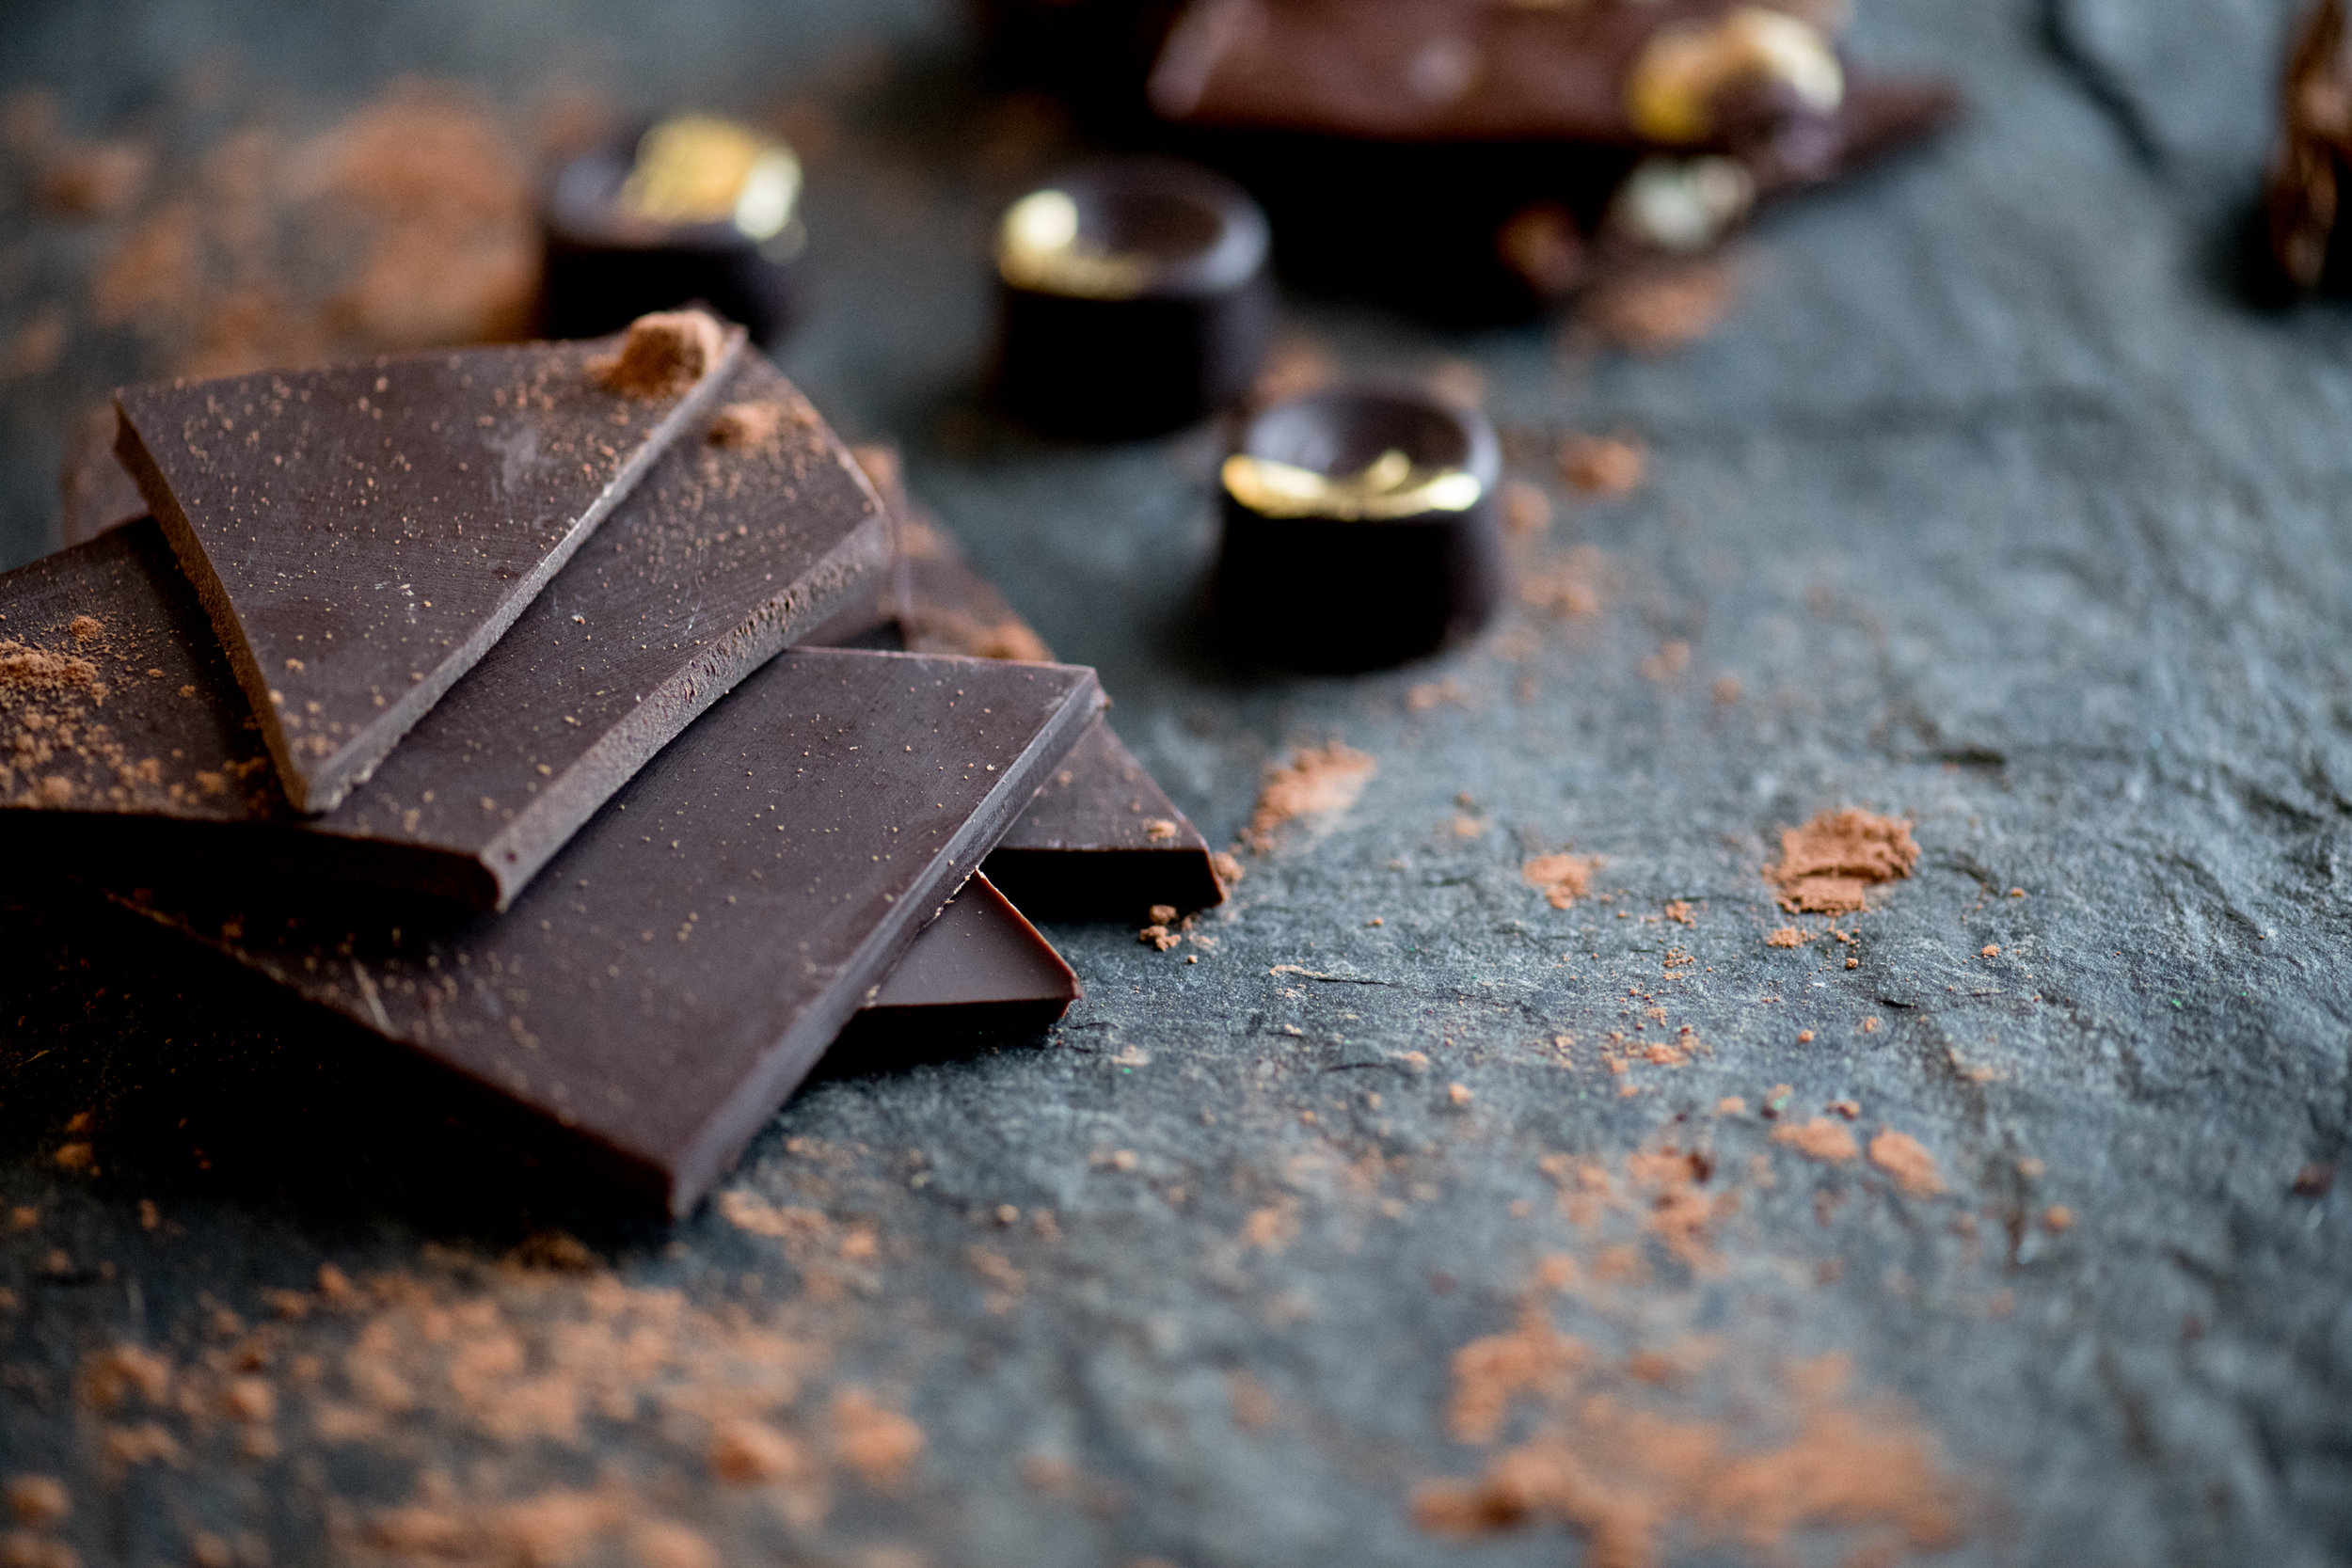 ctyp-Chocolate-2.jpg